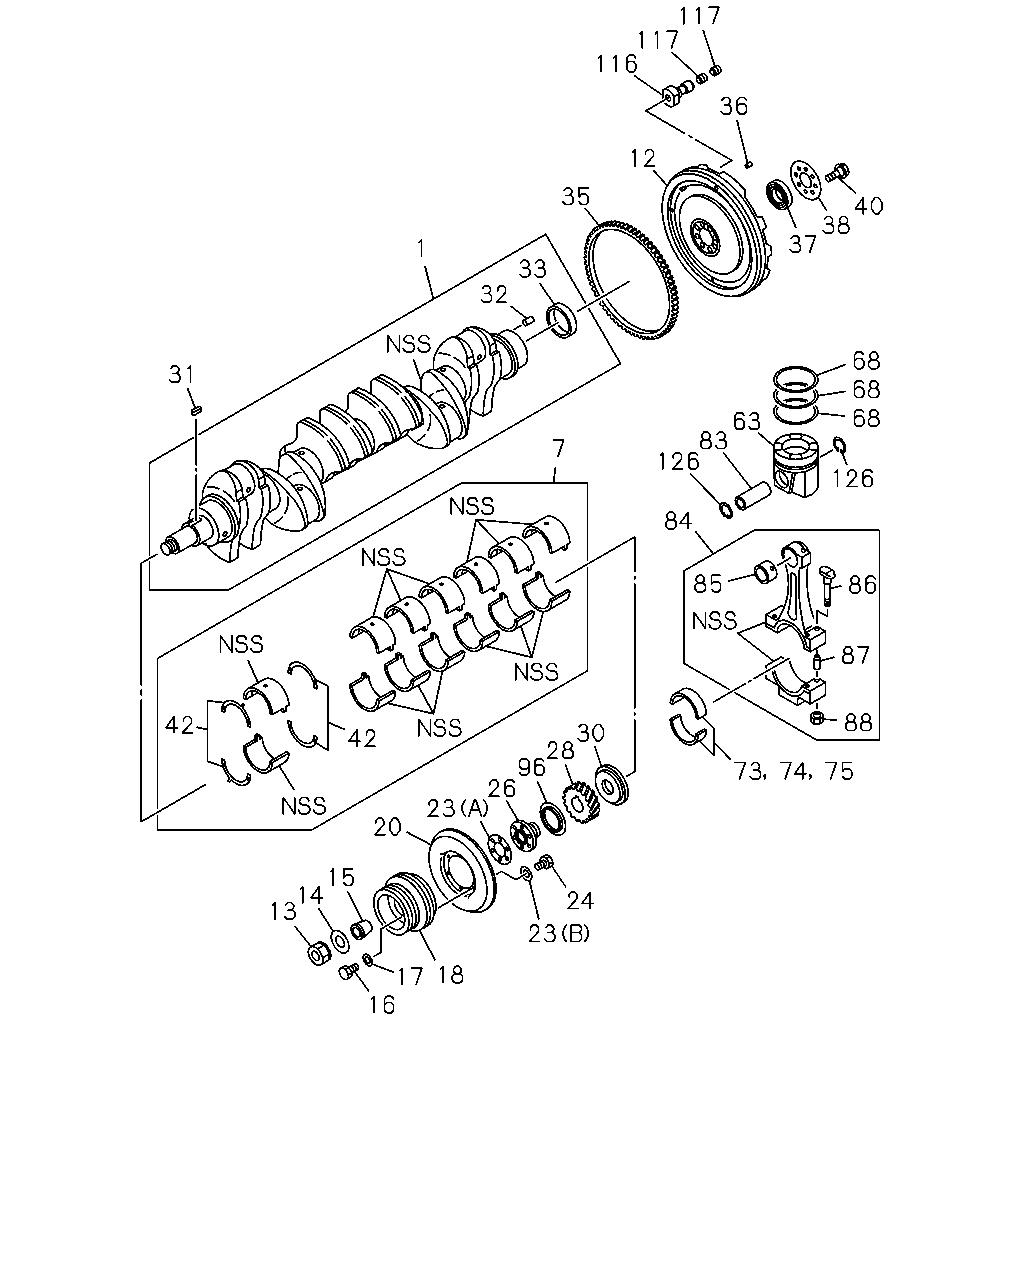 Ce 10658 Exr Rhd 90 95 0 Engine Emission Cat 236 Diagram Code